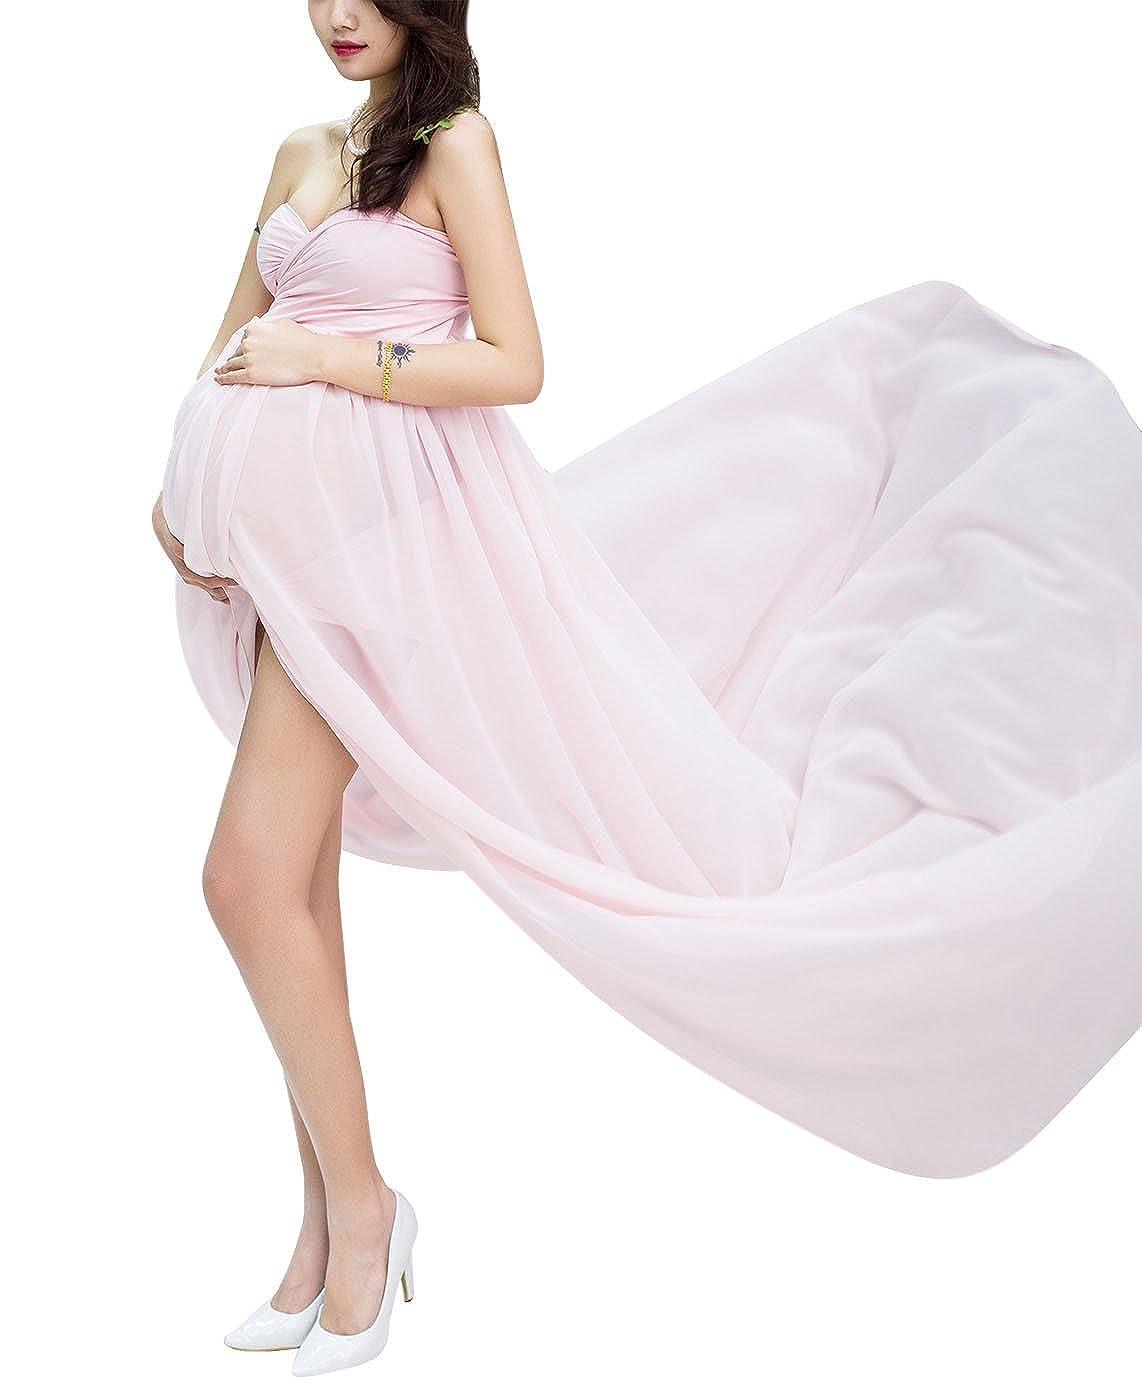 Maternity High Waist Photography Dress Full length Chiffon Gowns with Briefs Aivtalk